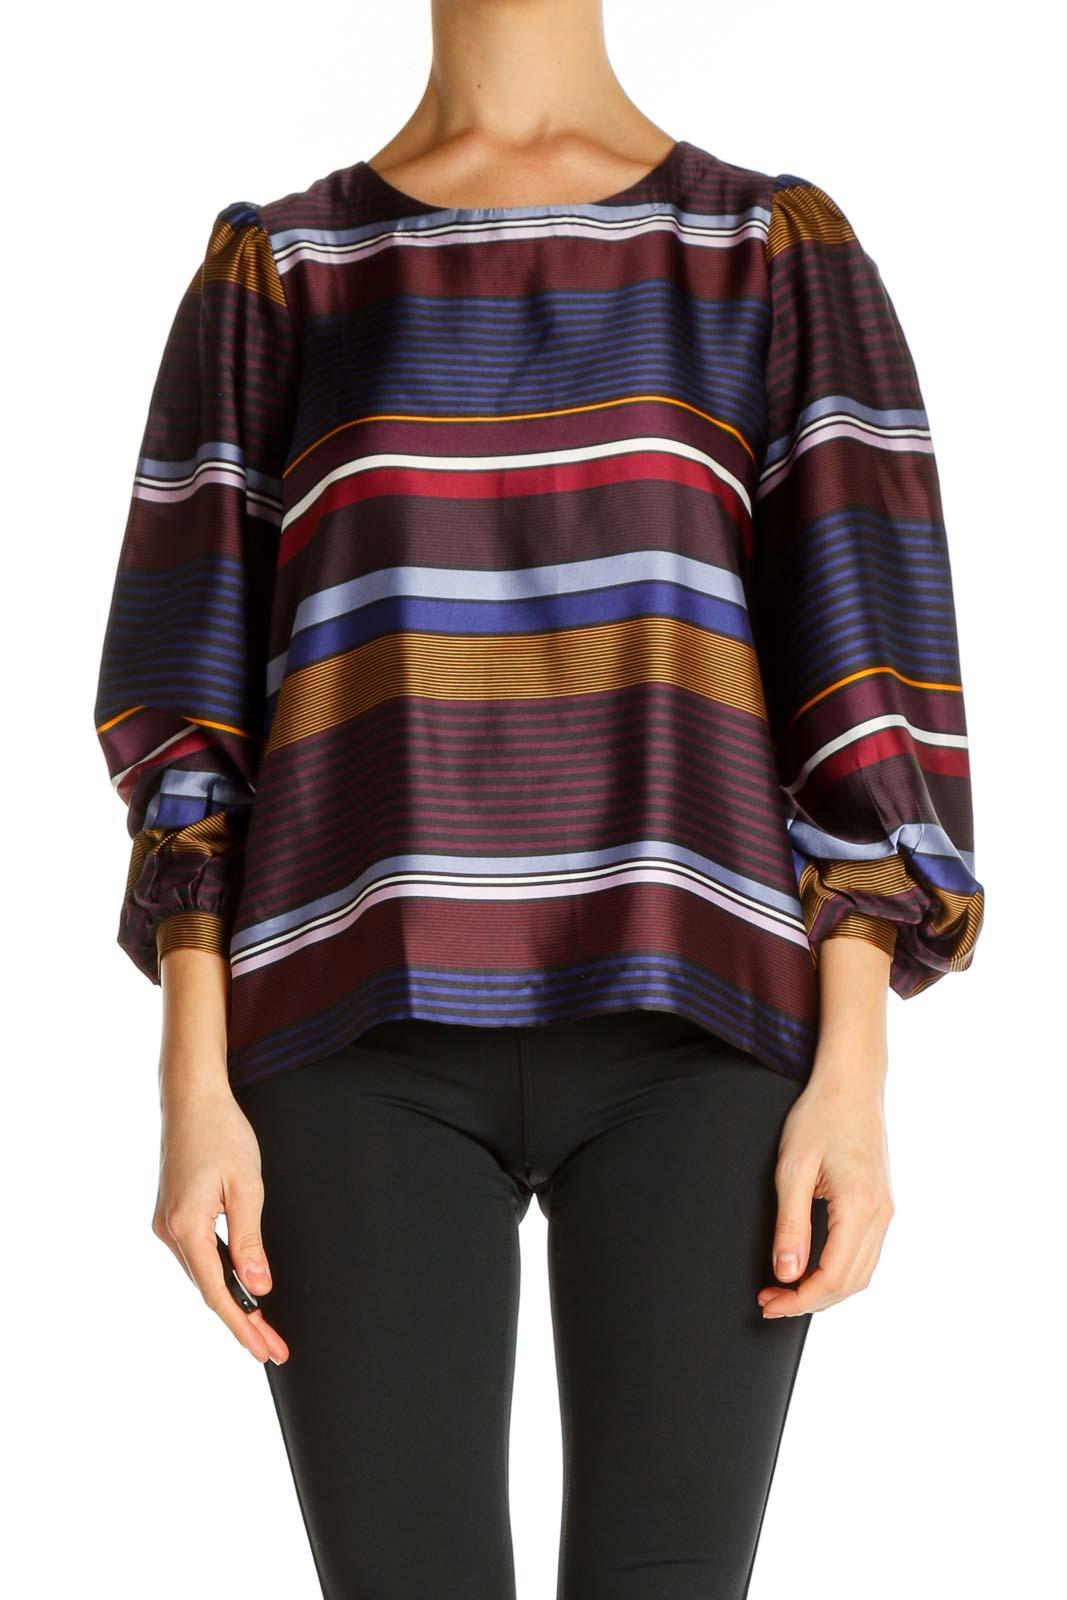 Gray Striped Retro T-Shirt Front